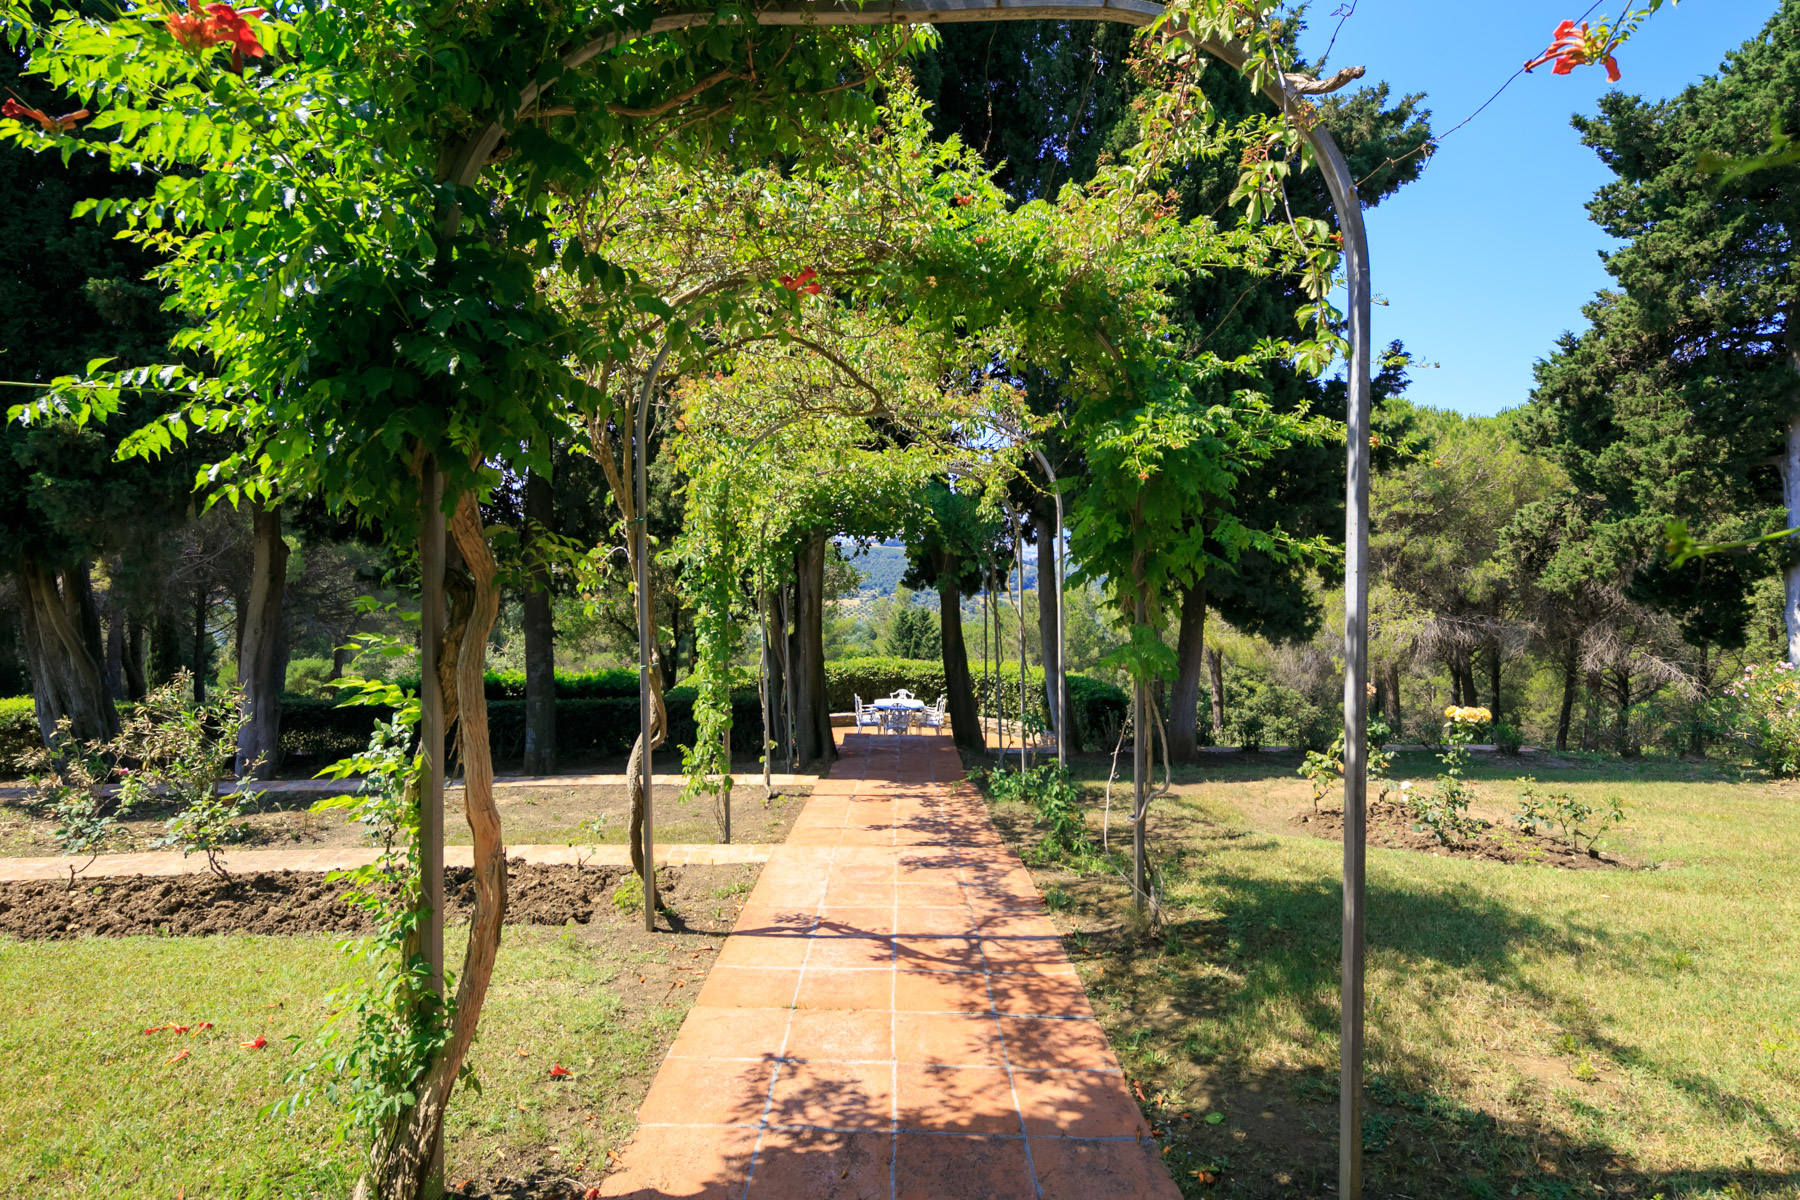 Villa in Vendita a Campiglia Marittima: 5 locali, 1100 mq - Foto 10